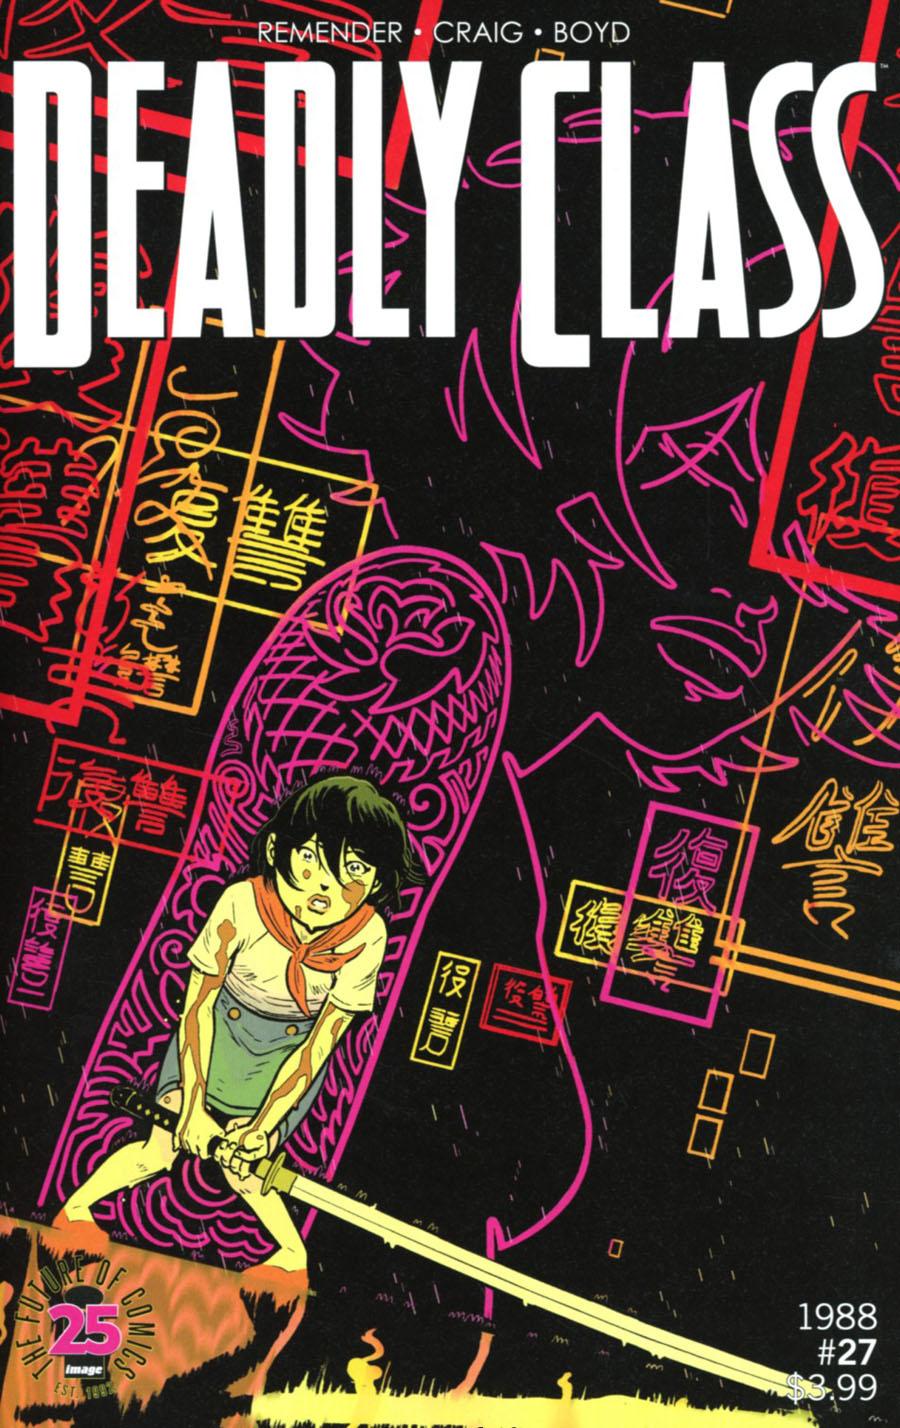 Deadly Class #27 Cover A Wes Craig & Jordan Boyd